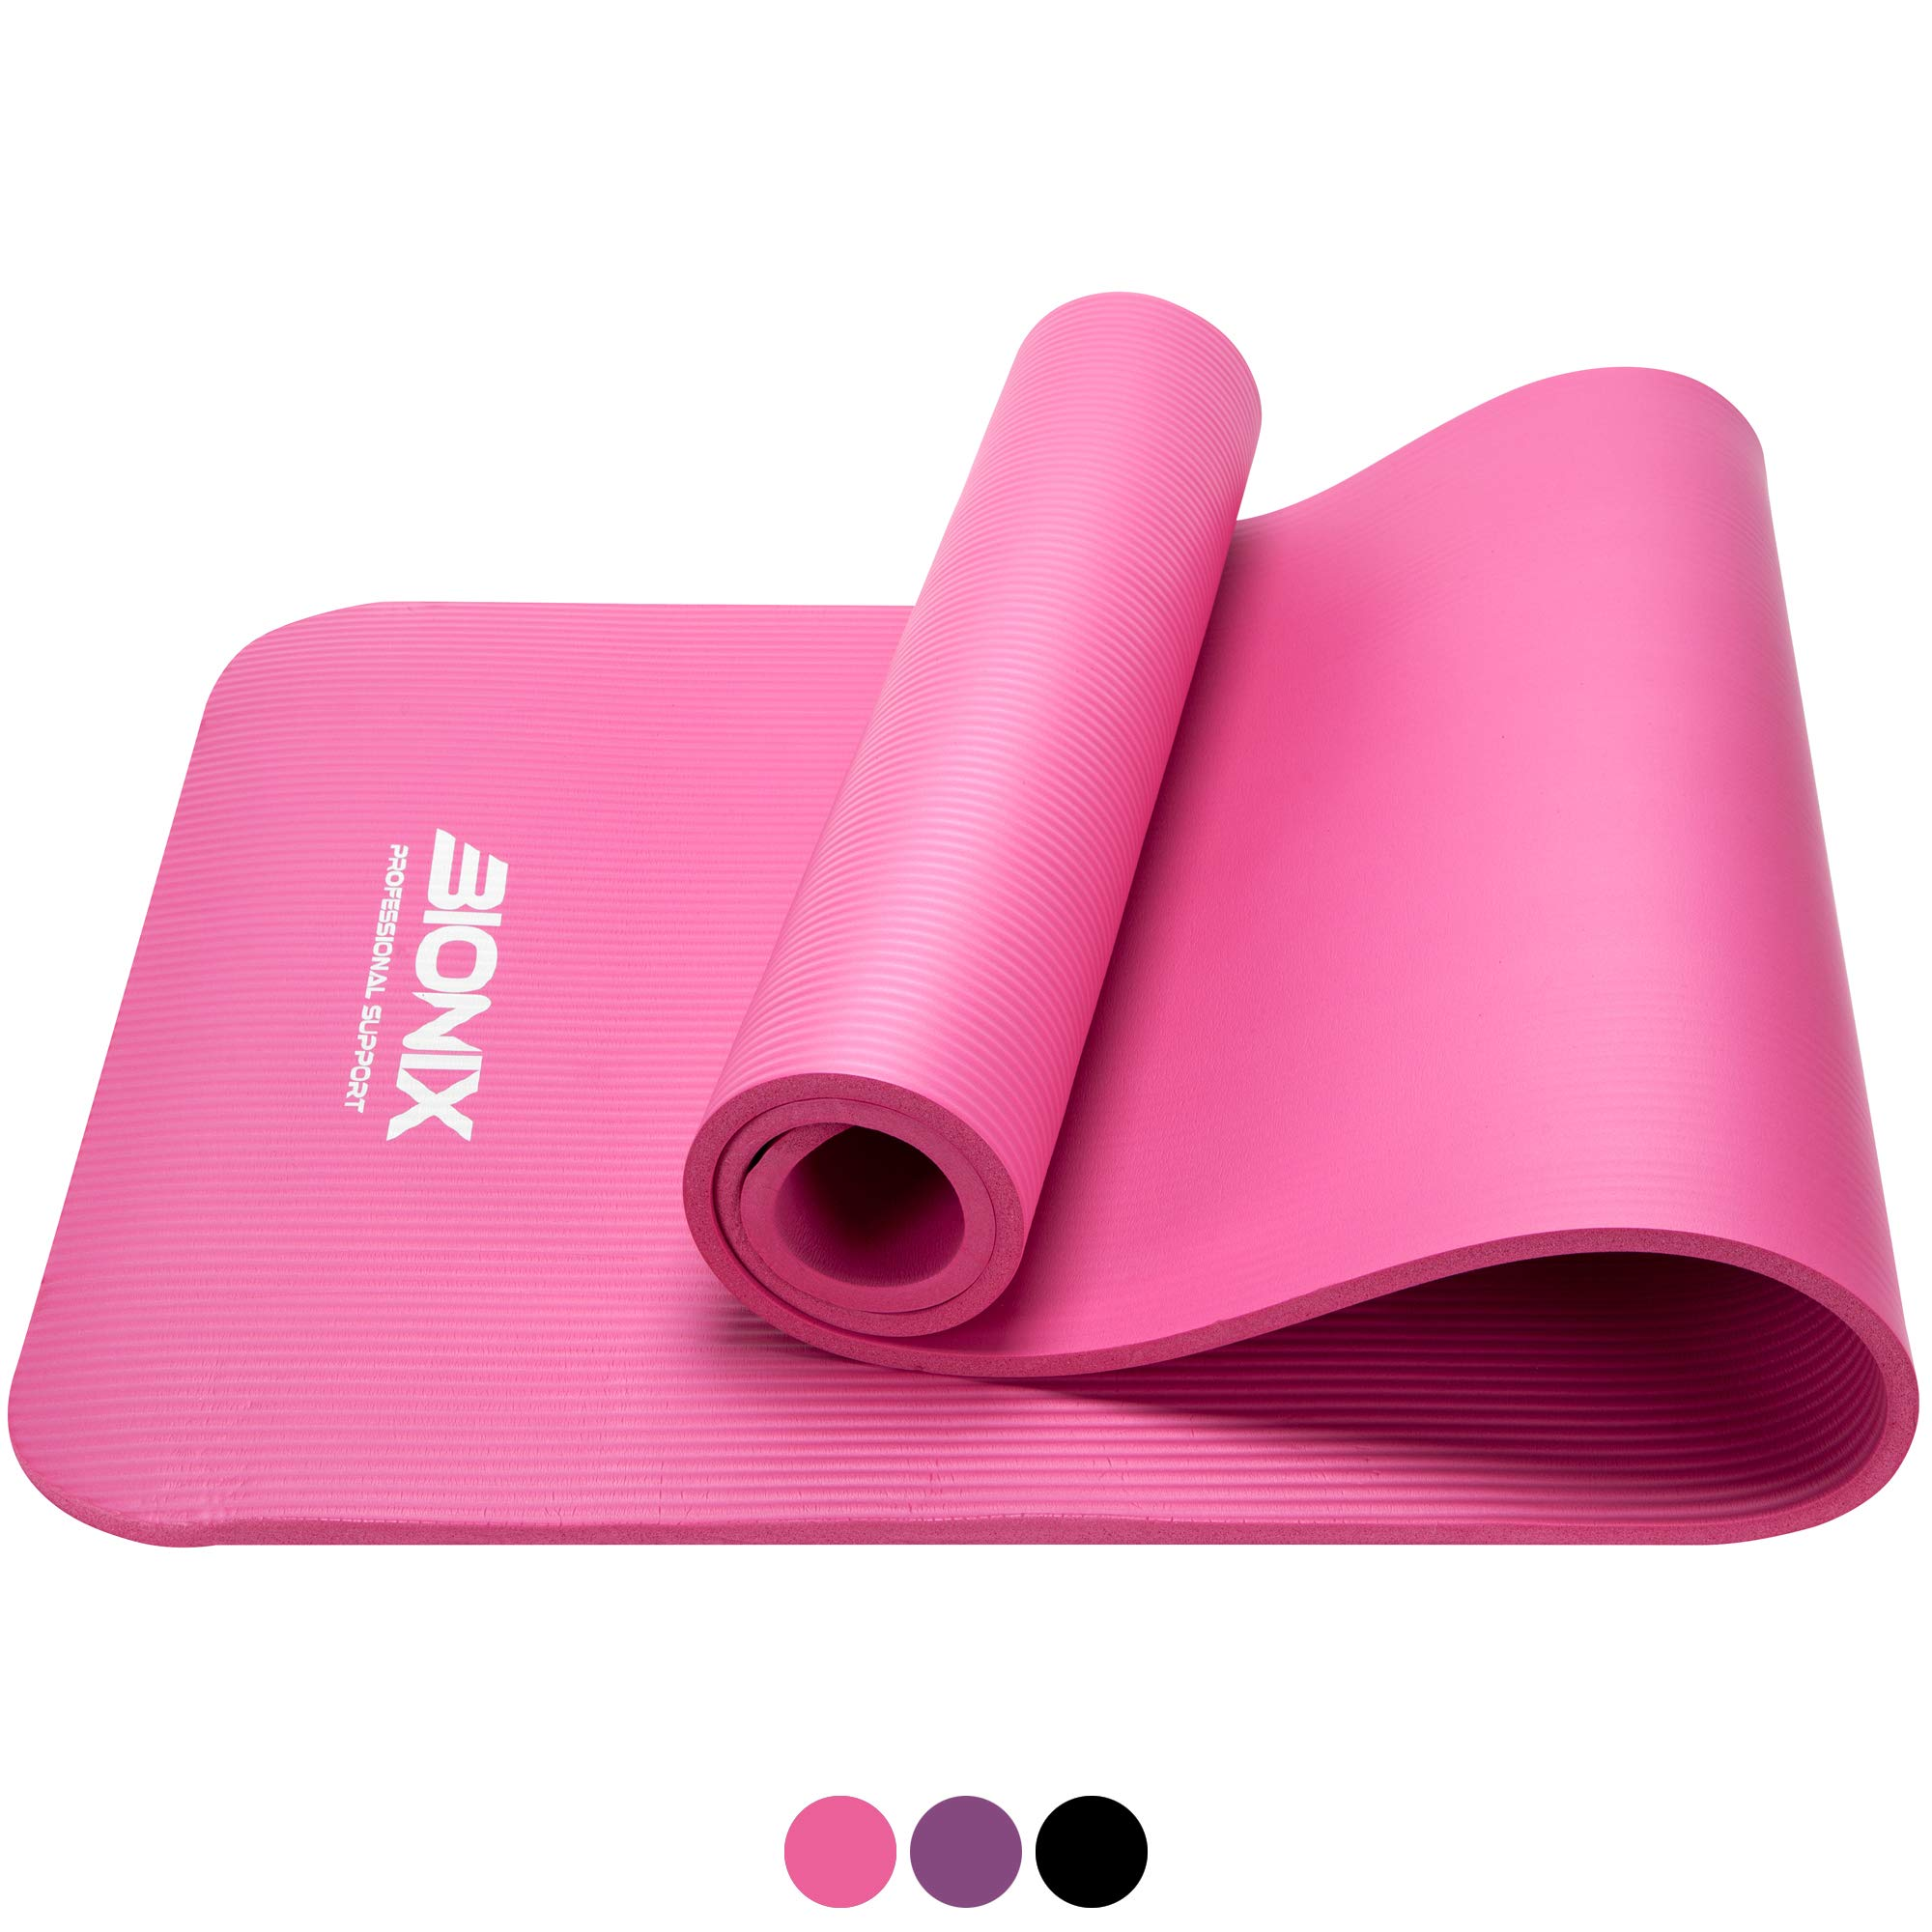 Home Workout Exercise Mat Non-Slip 1.5cm Thick Yoga Gymnastic Pilates Mats